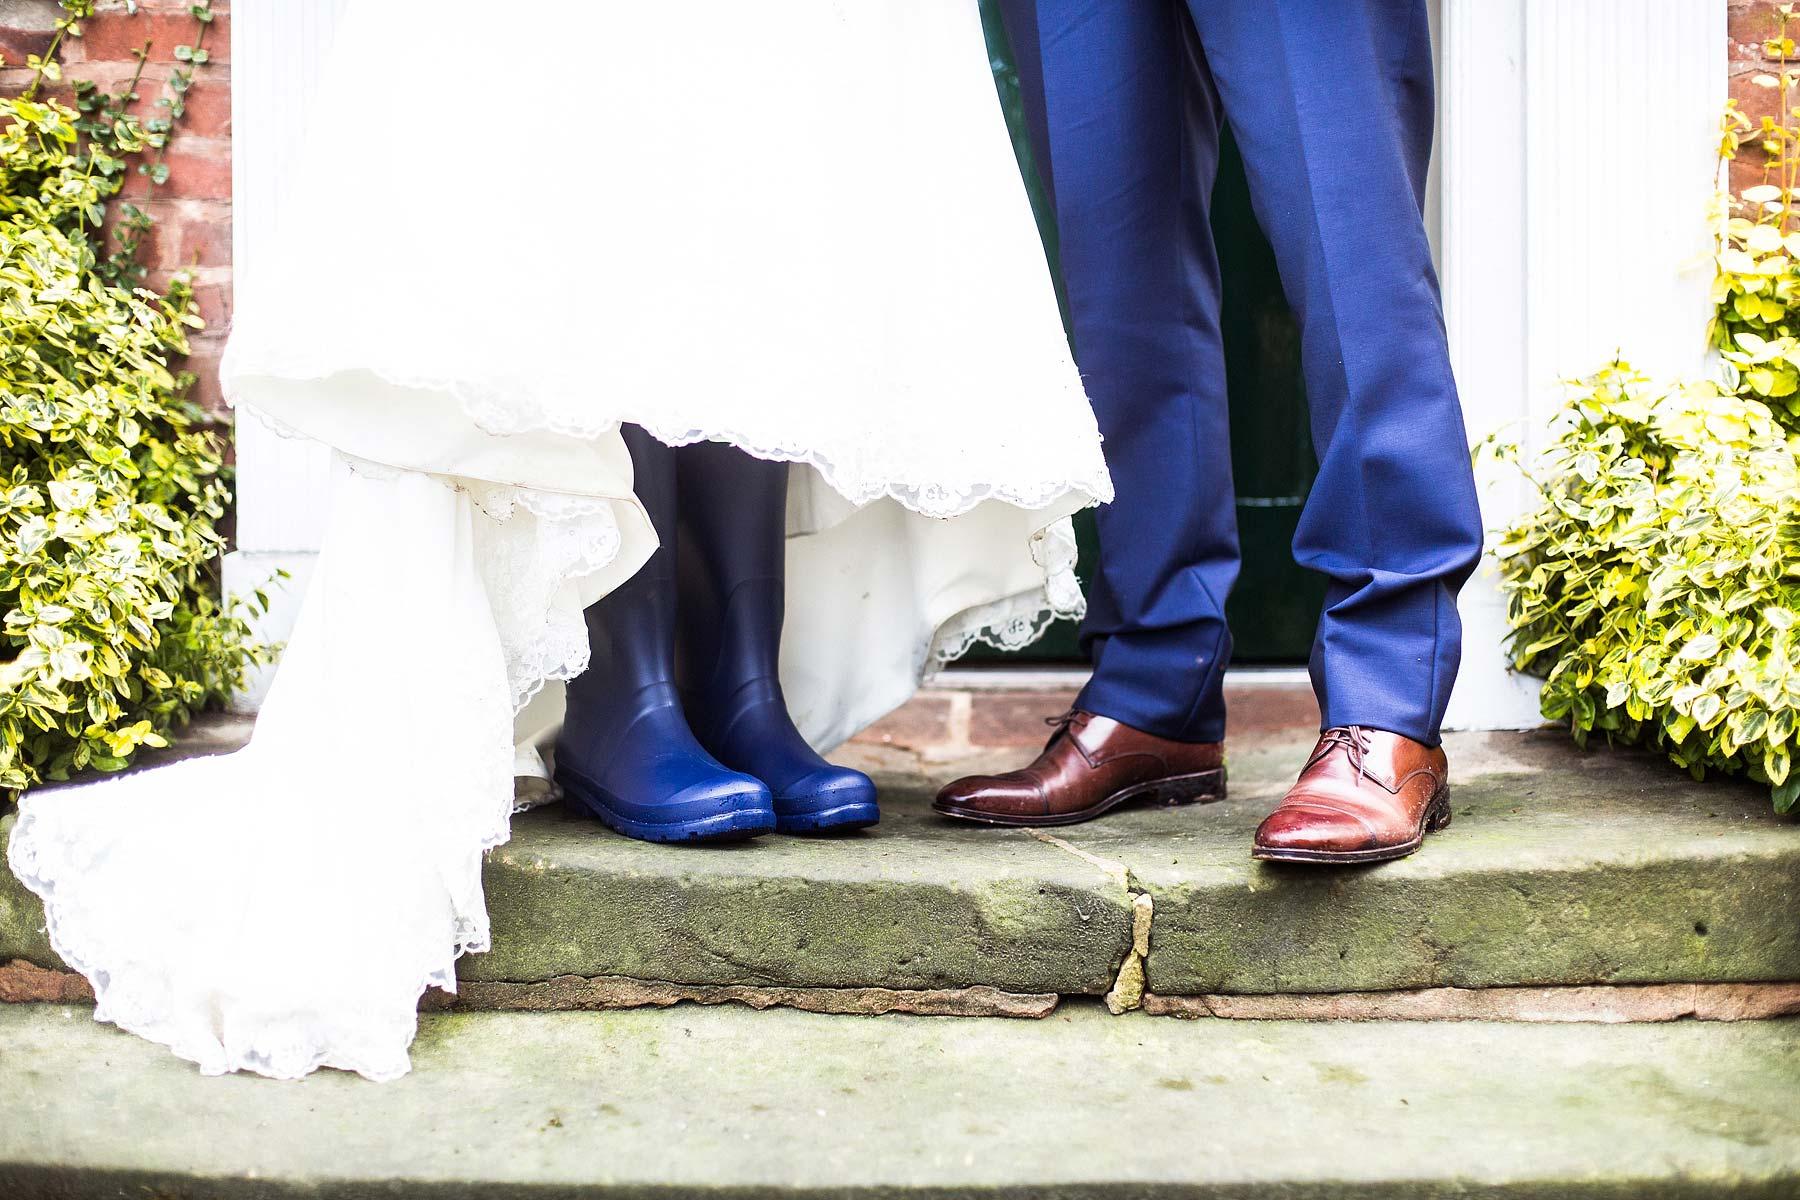 moat-house-winter-wedding-photography-001